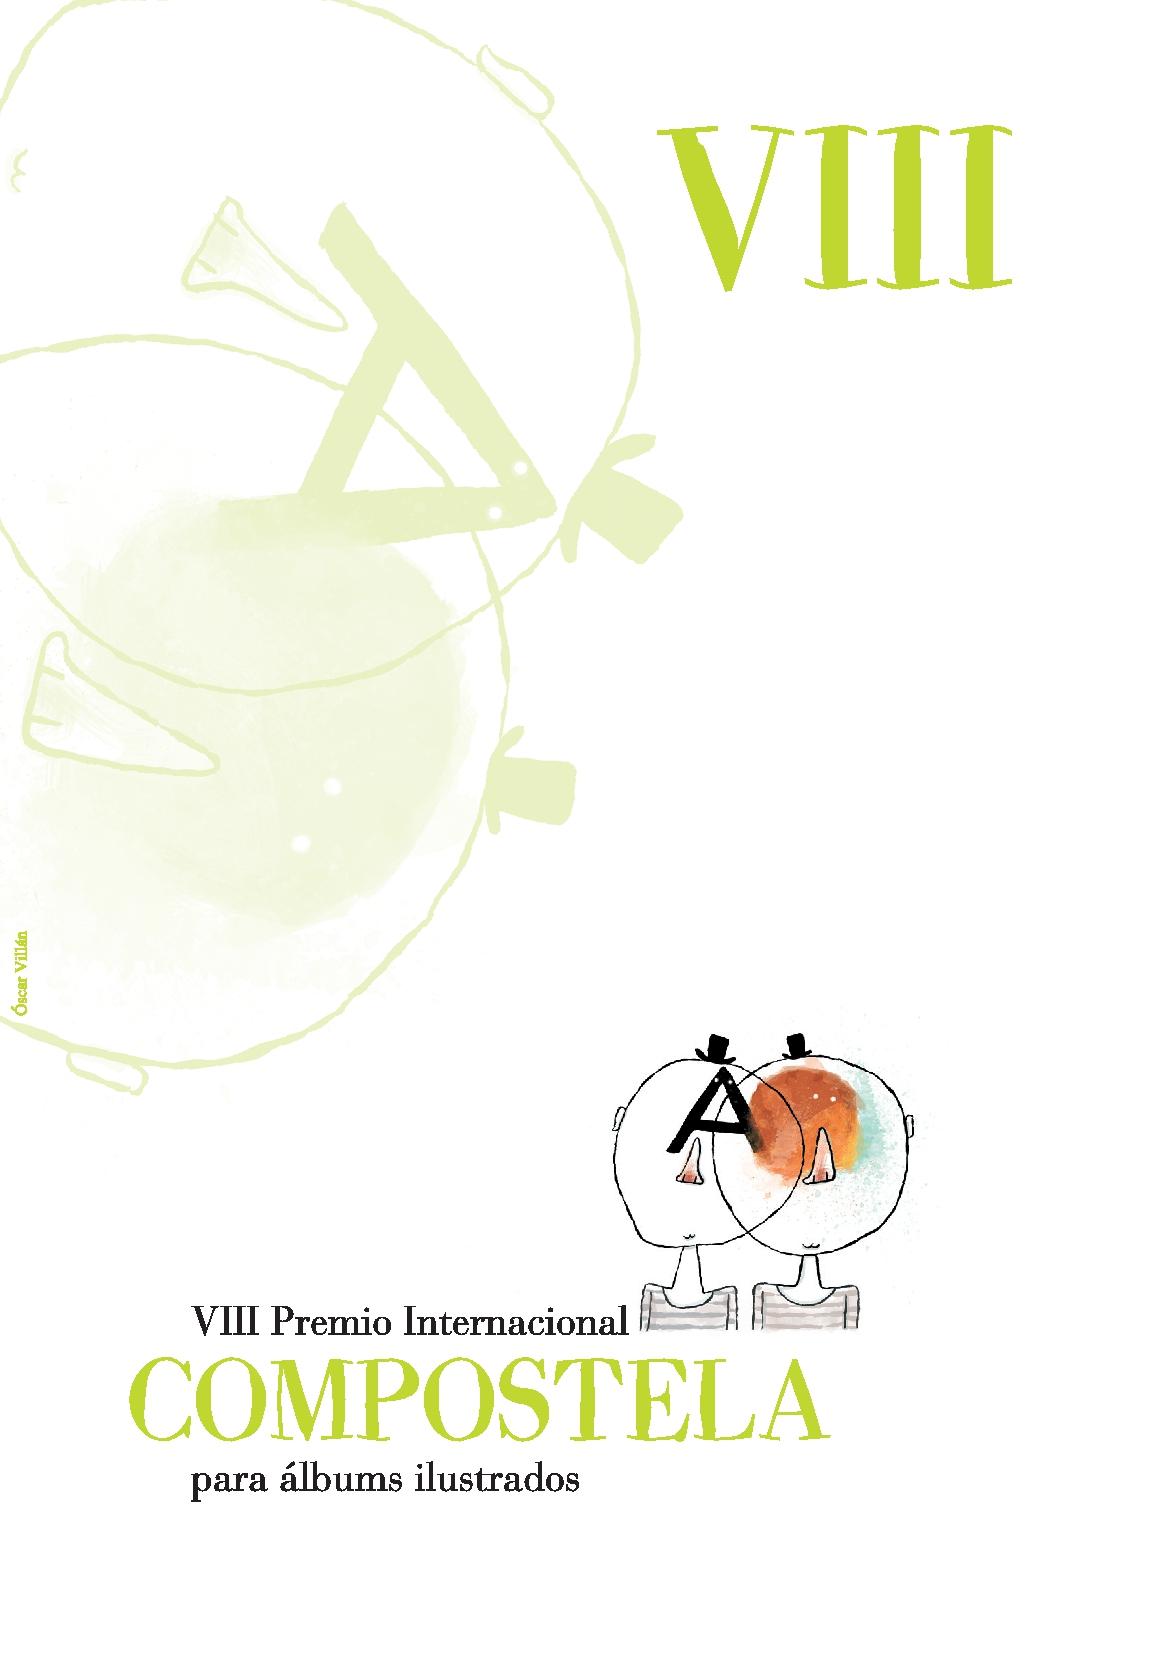 Premio Compostela 1